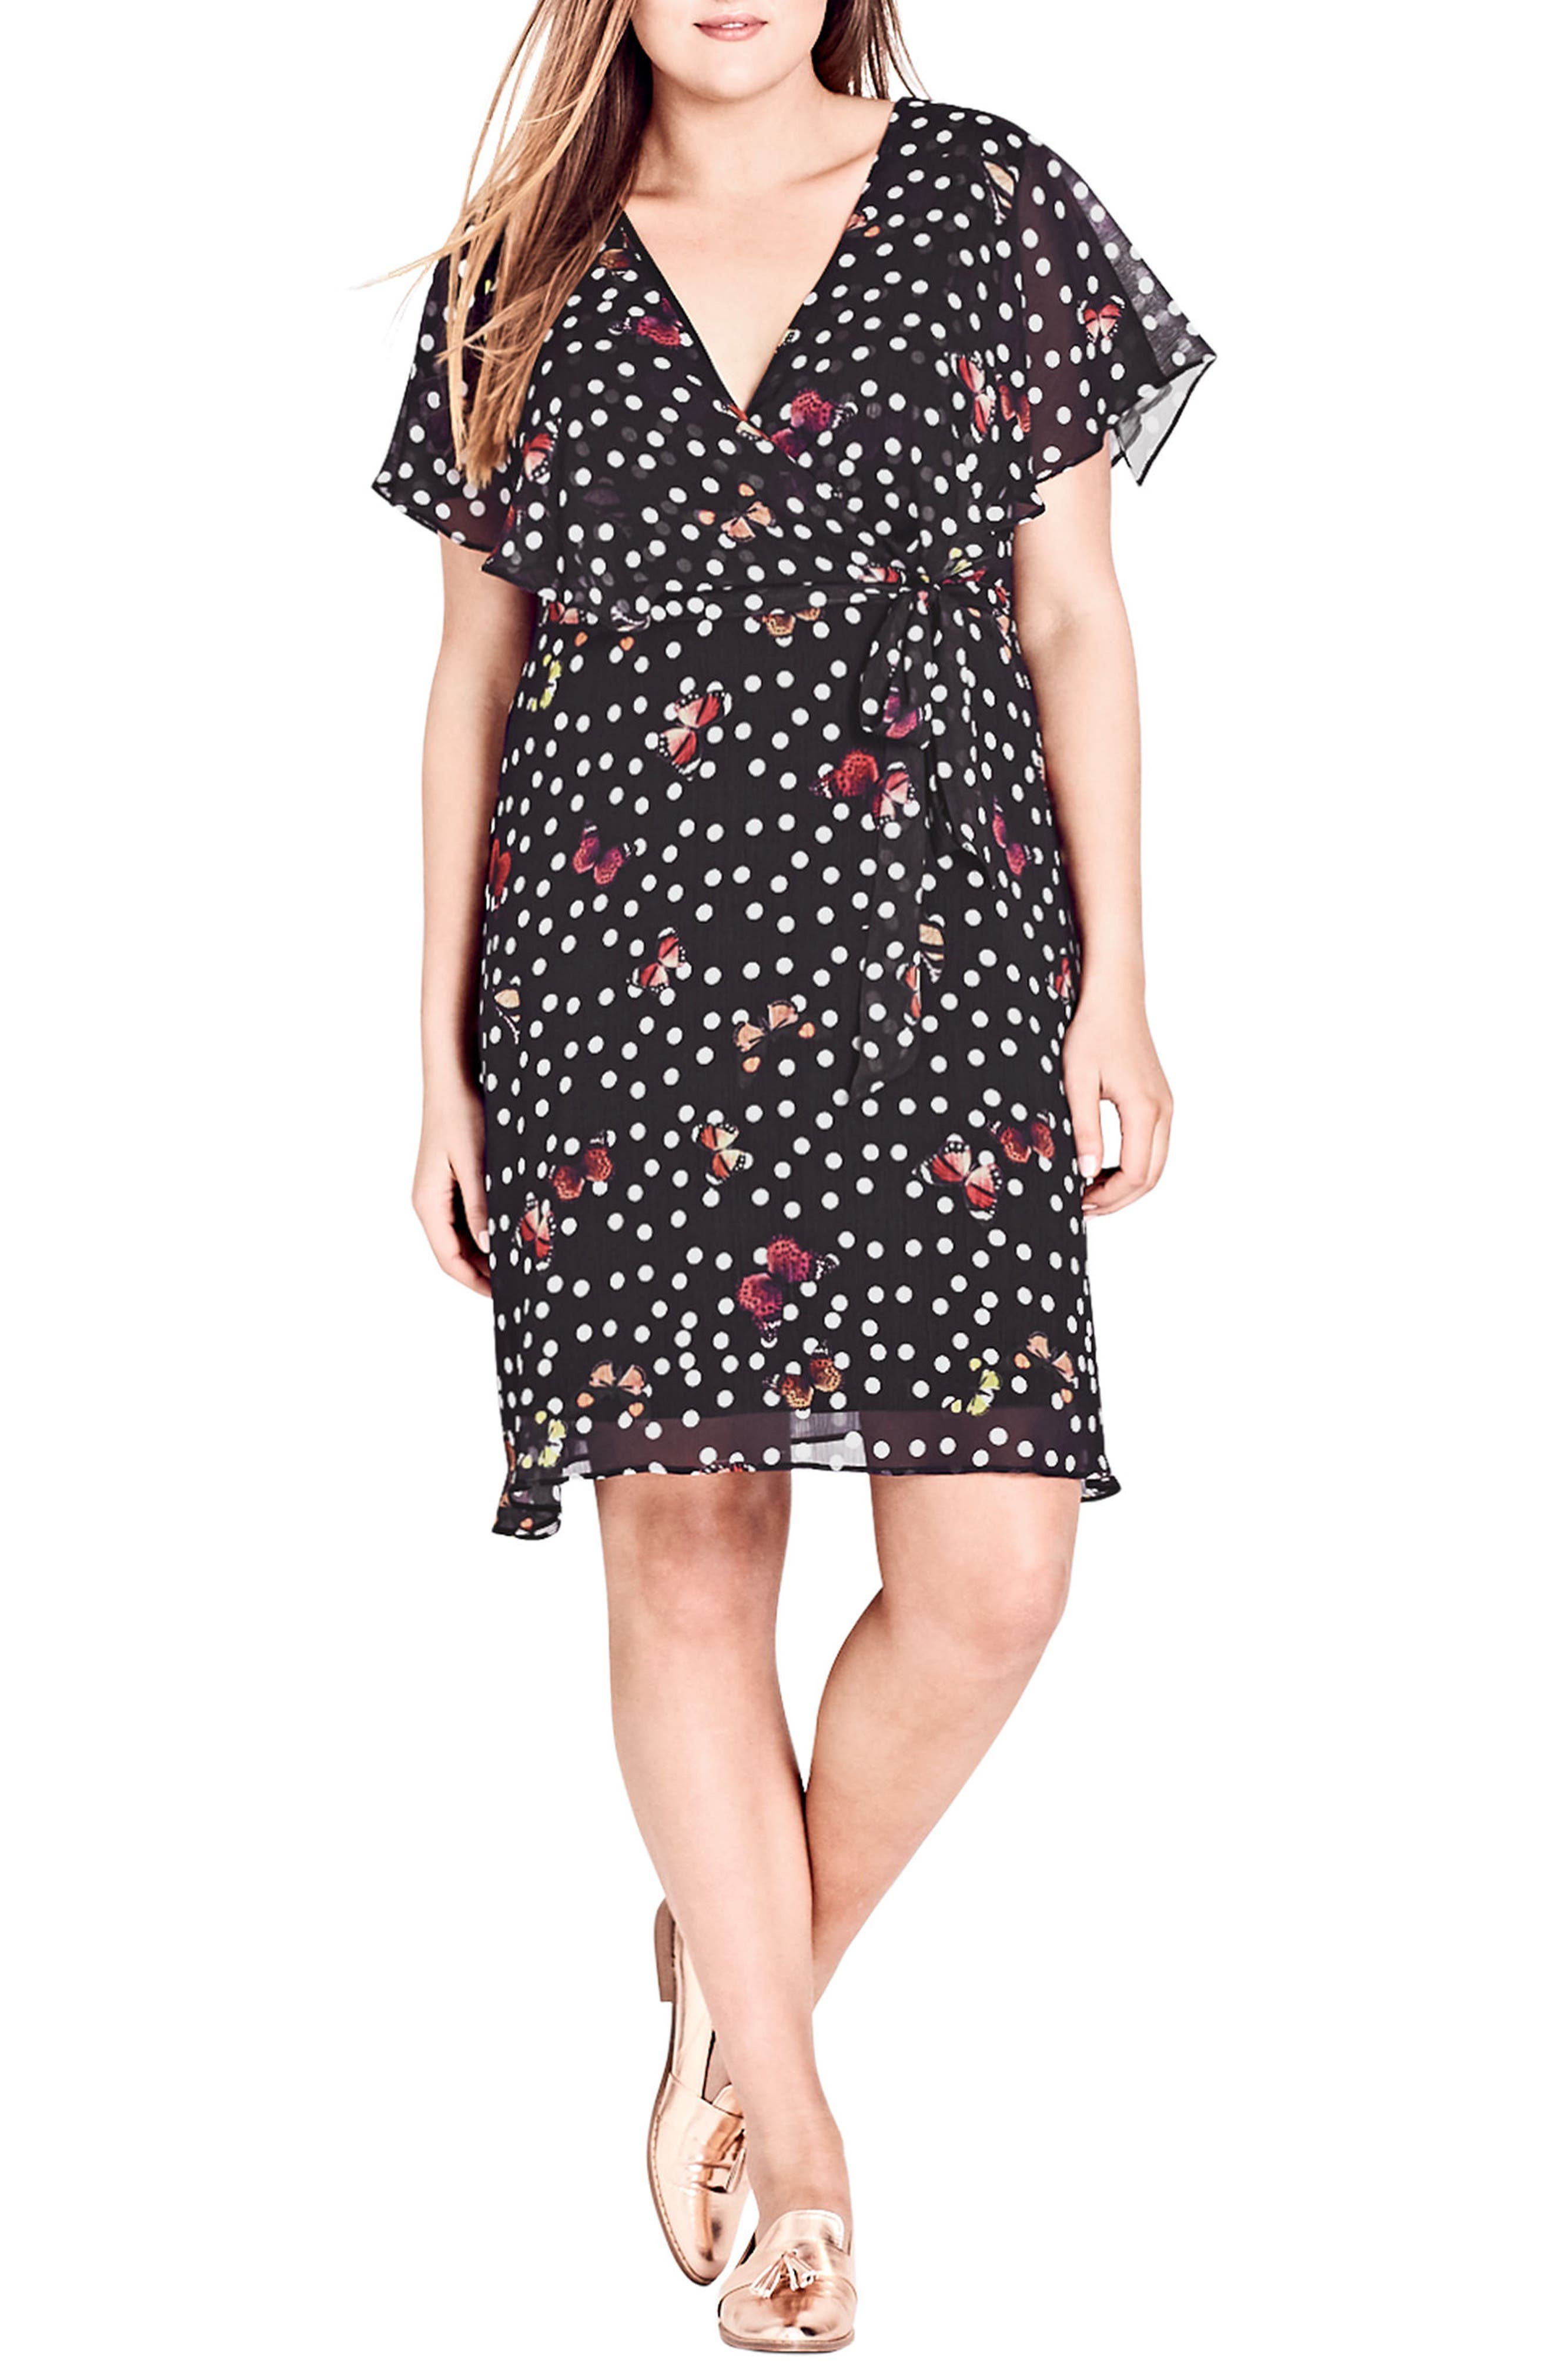 CITY CHIC Butterfly Love Faux Wrap Dress, Main, color, 001